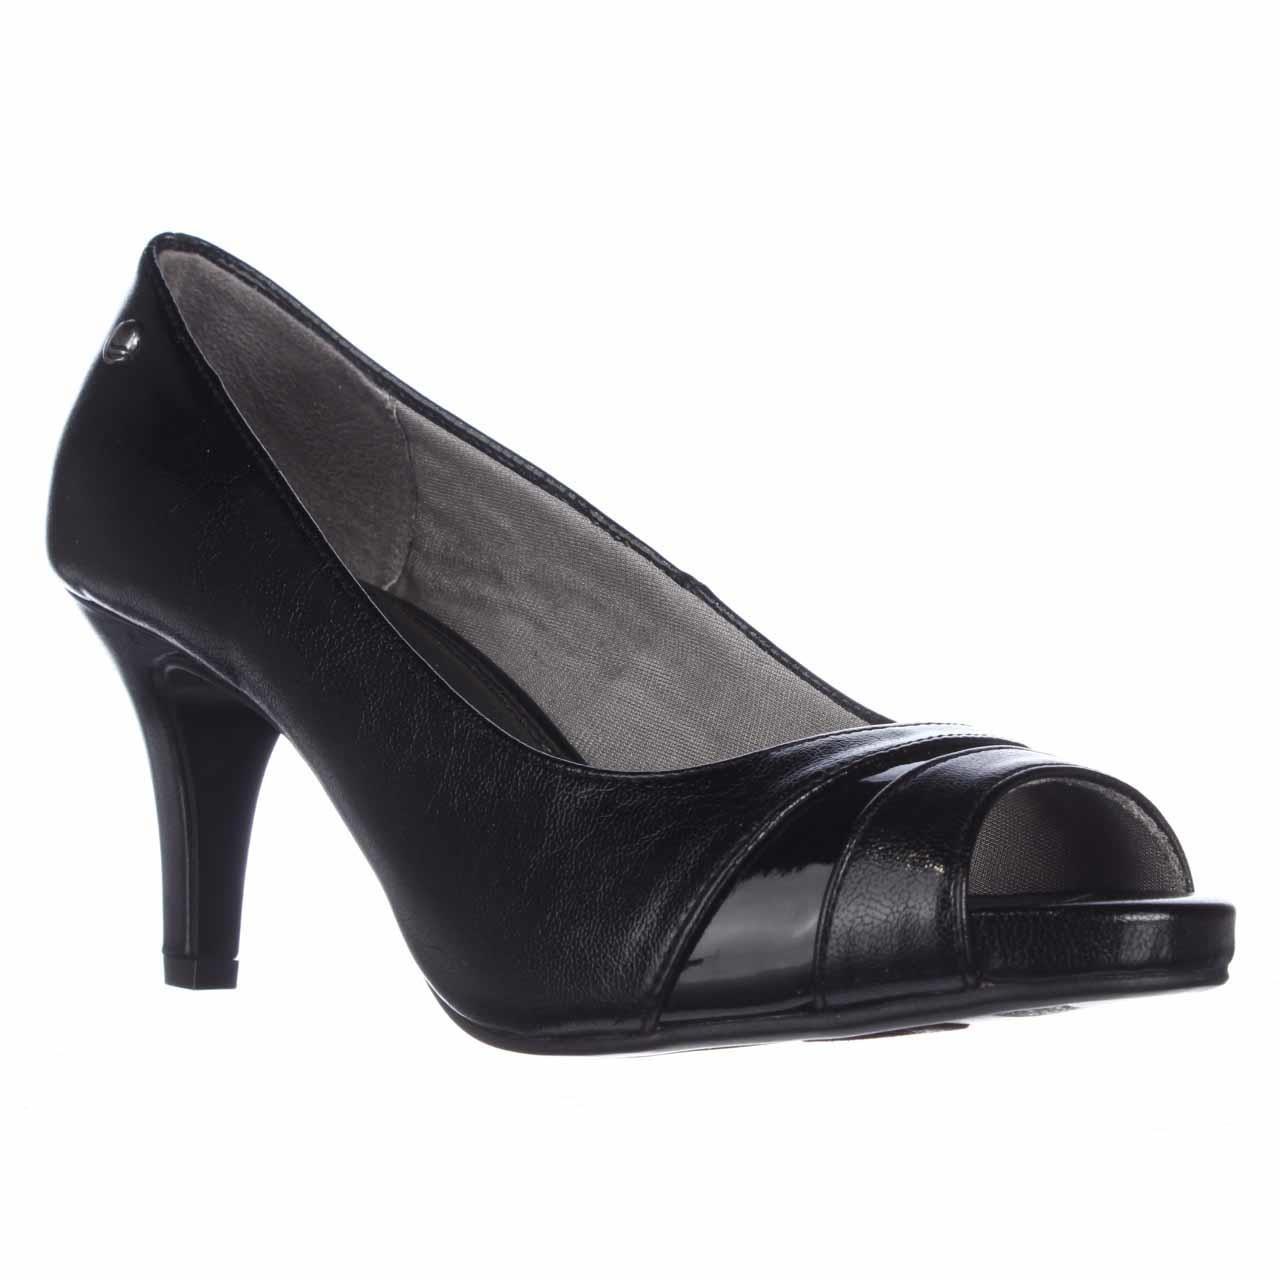 Black Peep Toe Kitten Heels